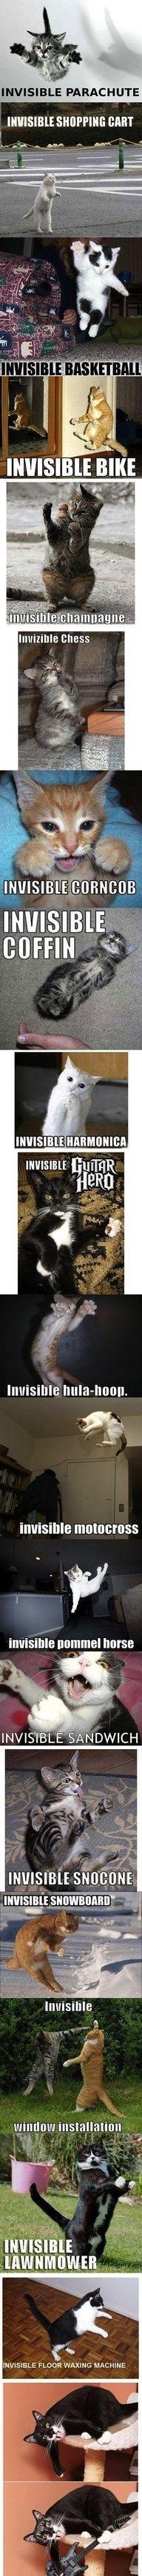 Invisible Cats - via ePinner http://amzn.to/HeQlfW